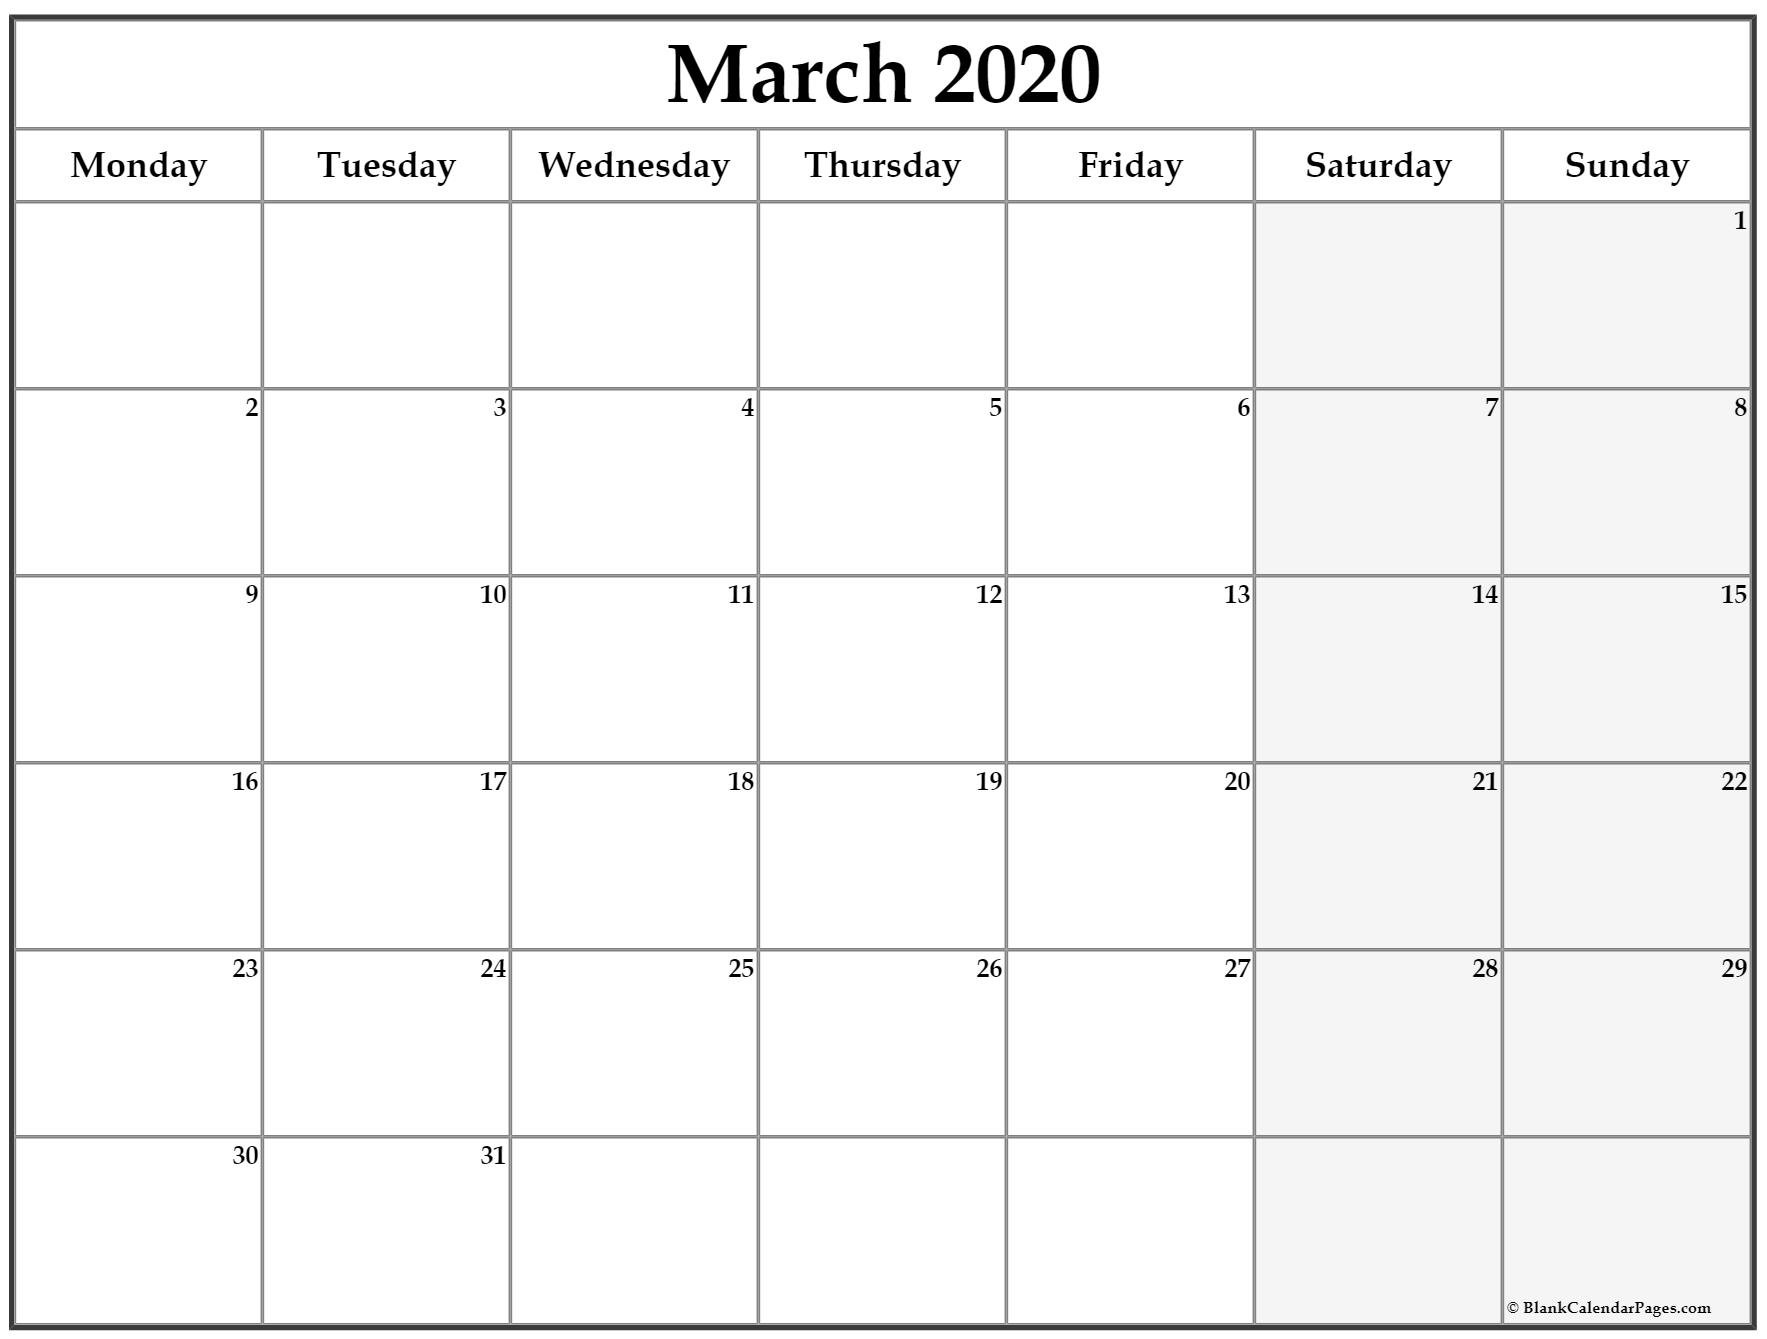 March 2020 Monday Calendar   Monday To Sunday Blank Monday Through Friday Month Calendar Template